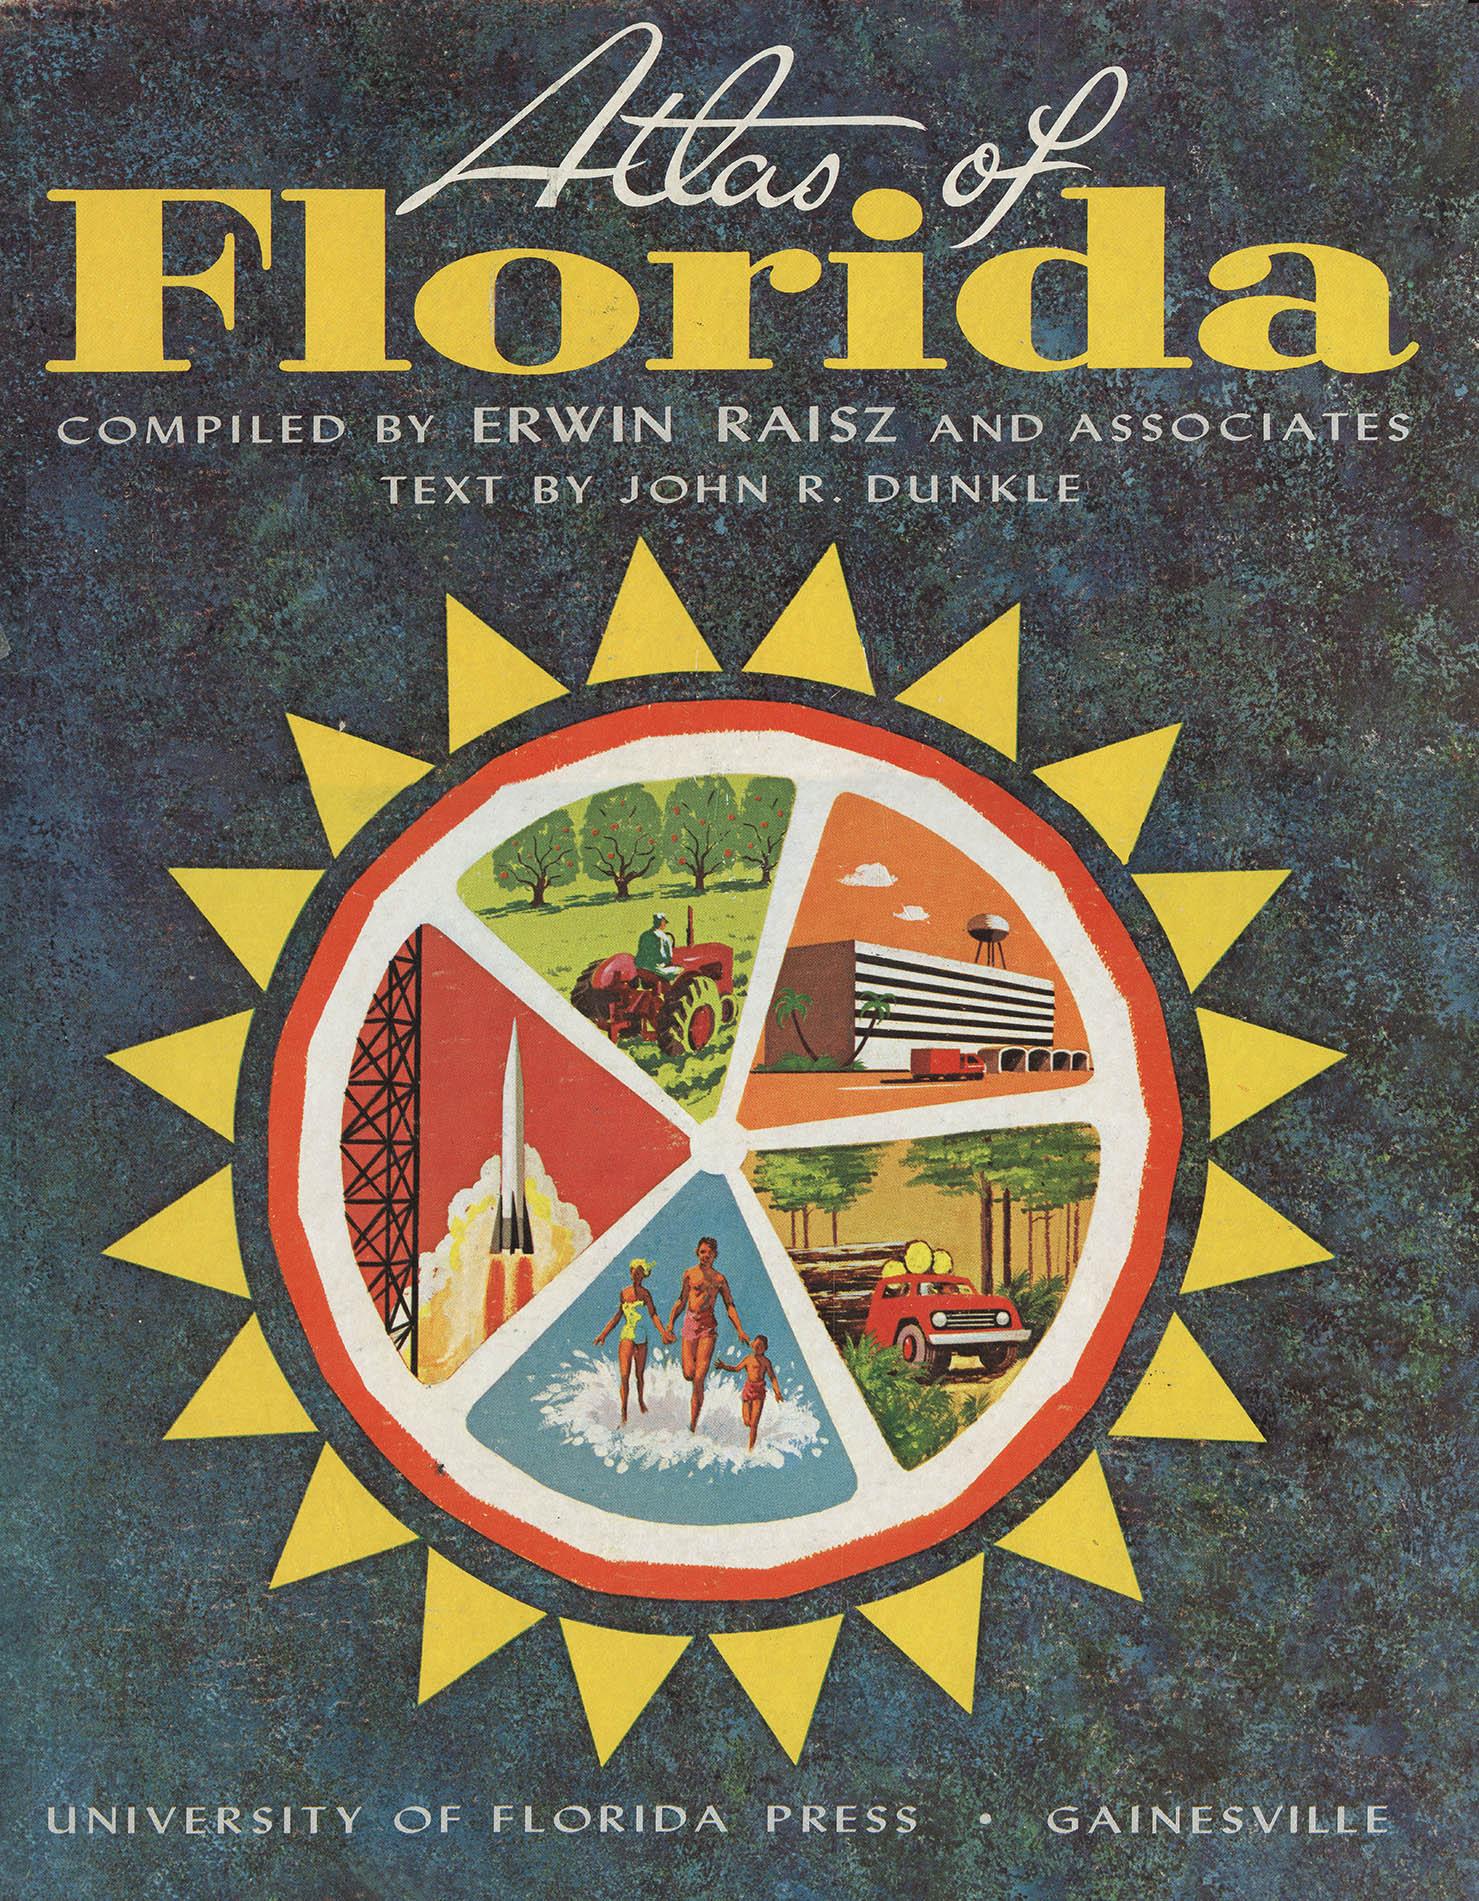 Altas of florida atlas of florida click for larger image publicscrutiny Images